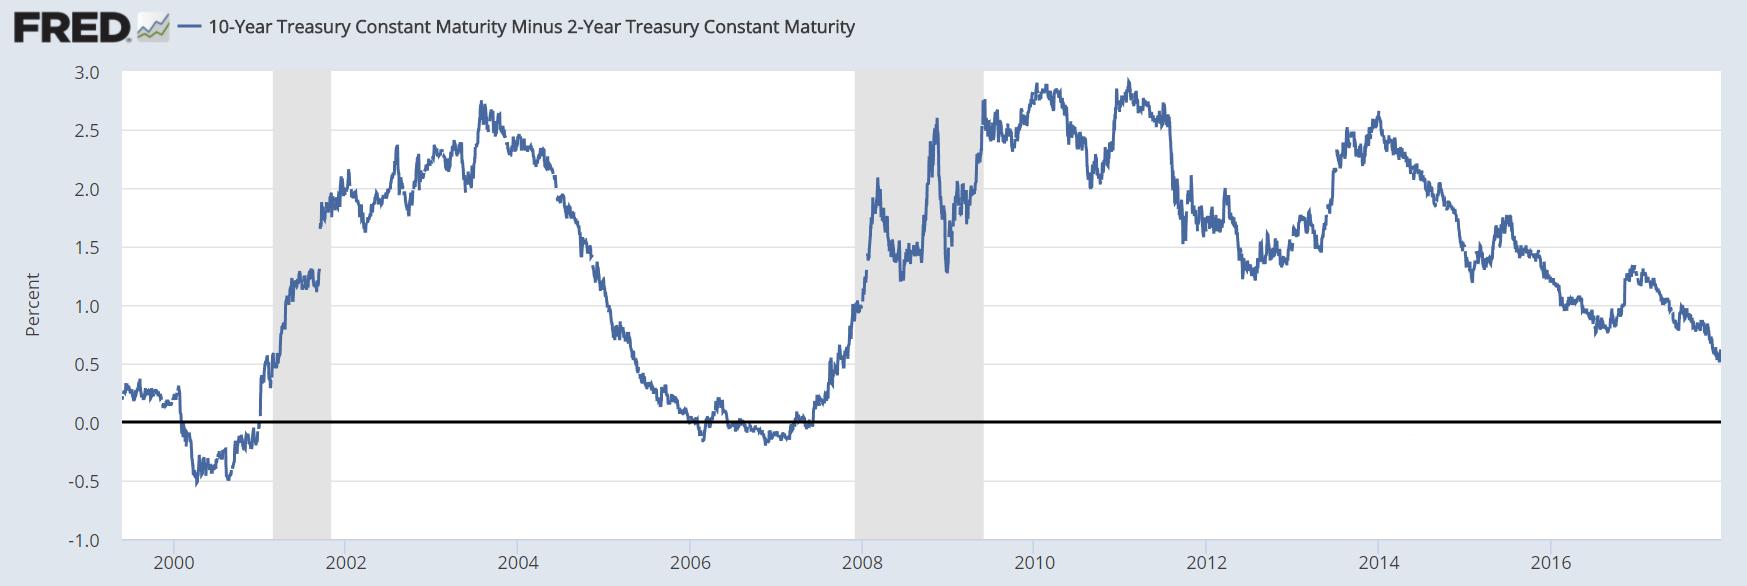 10 Year Bond Yield Minus 2 Year Bond